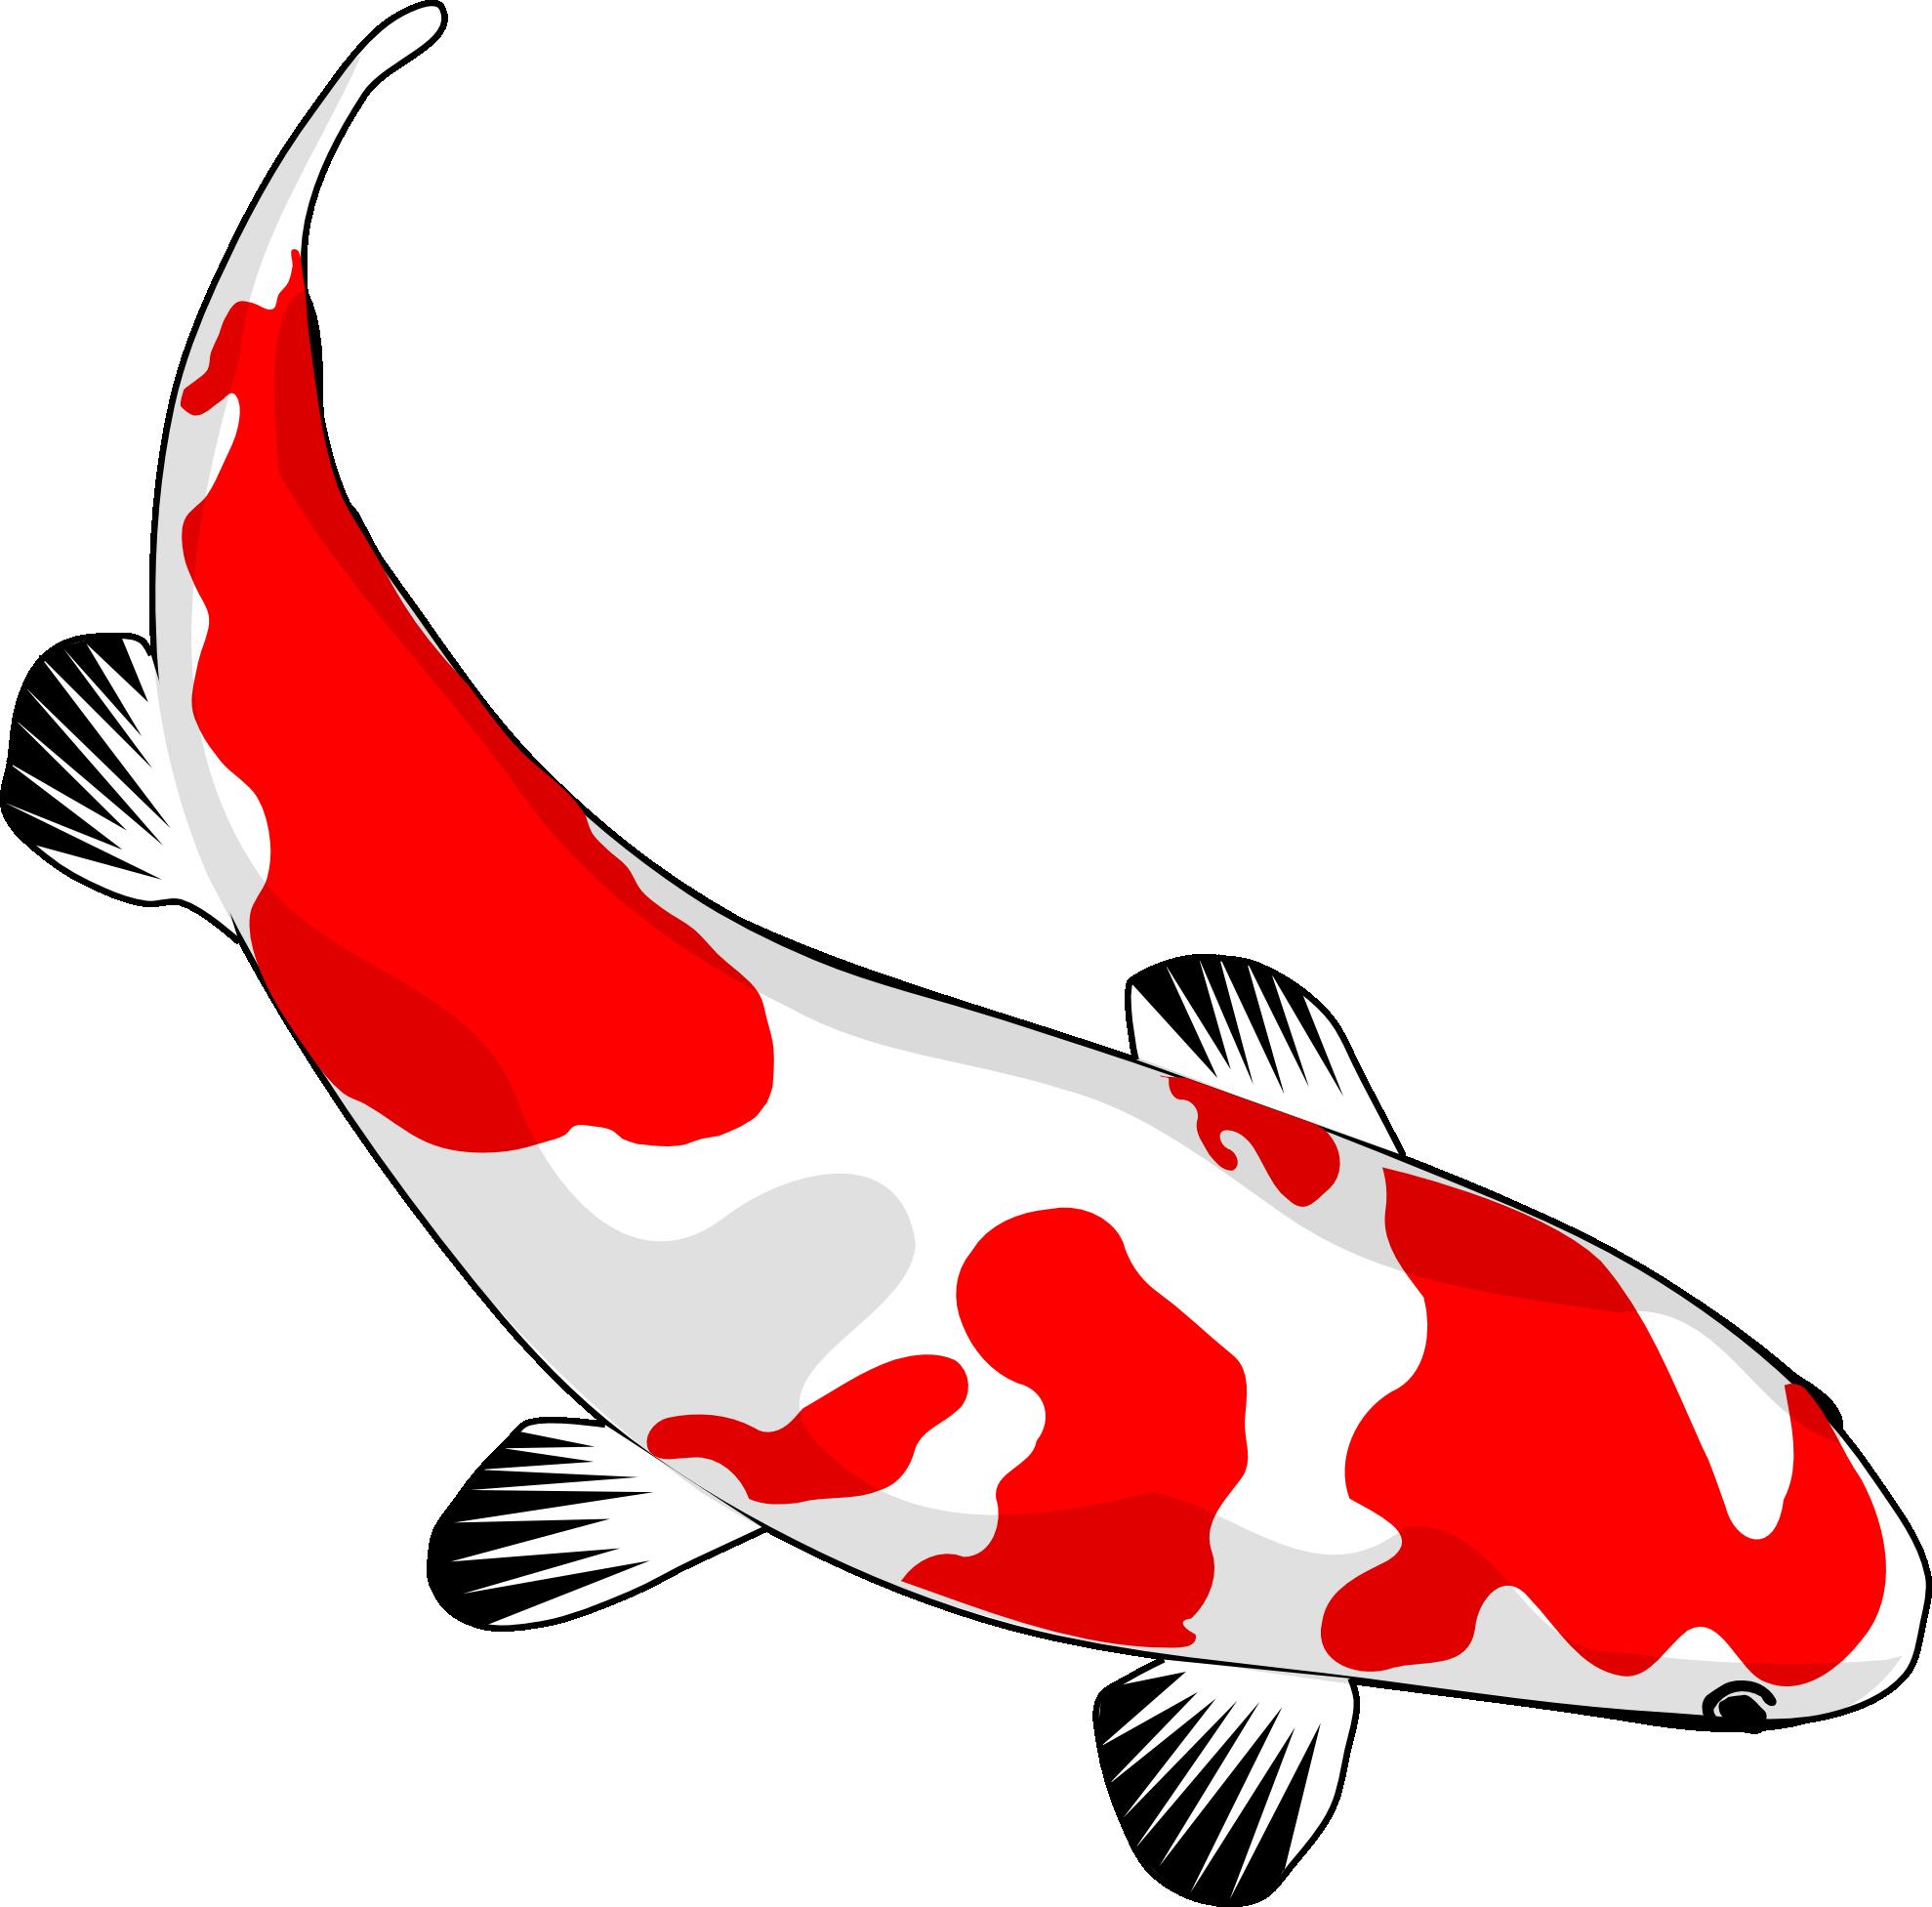 koi fish clip art 842852 png art pinterest koi koi art and rh pinterest com koi fish vector png koi fish vector drawing